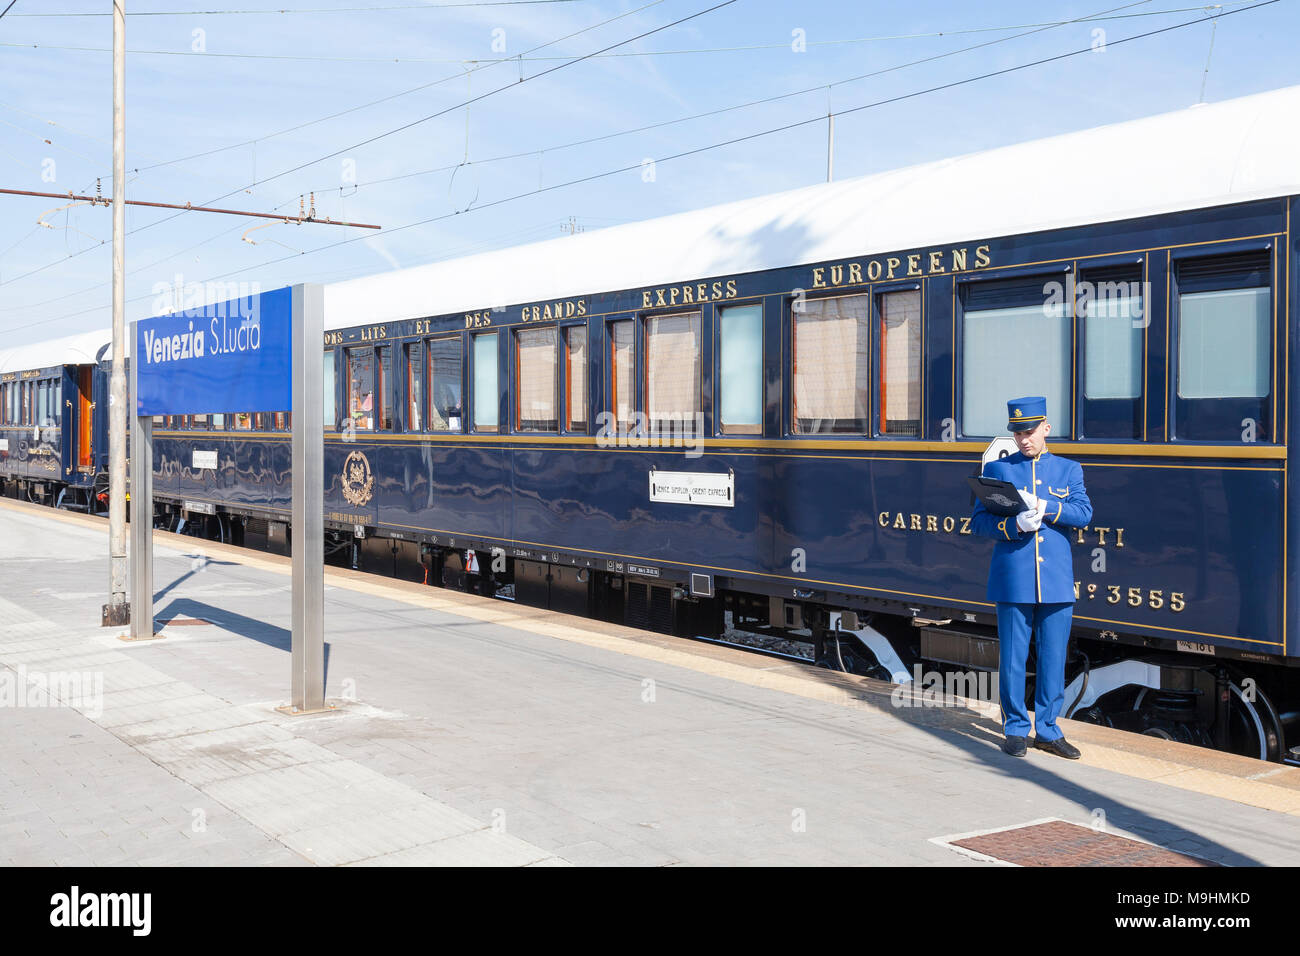 j k railway stations in venice - photo#46